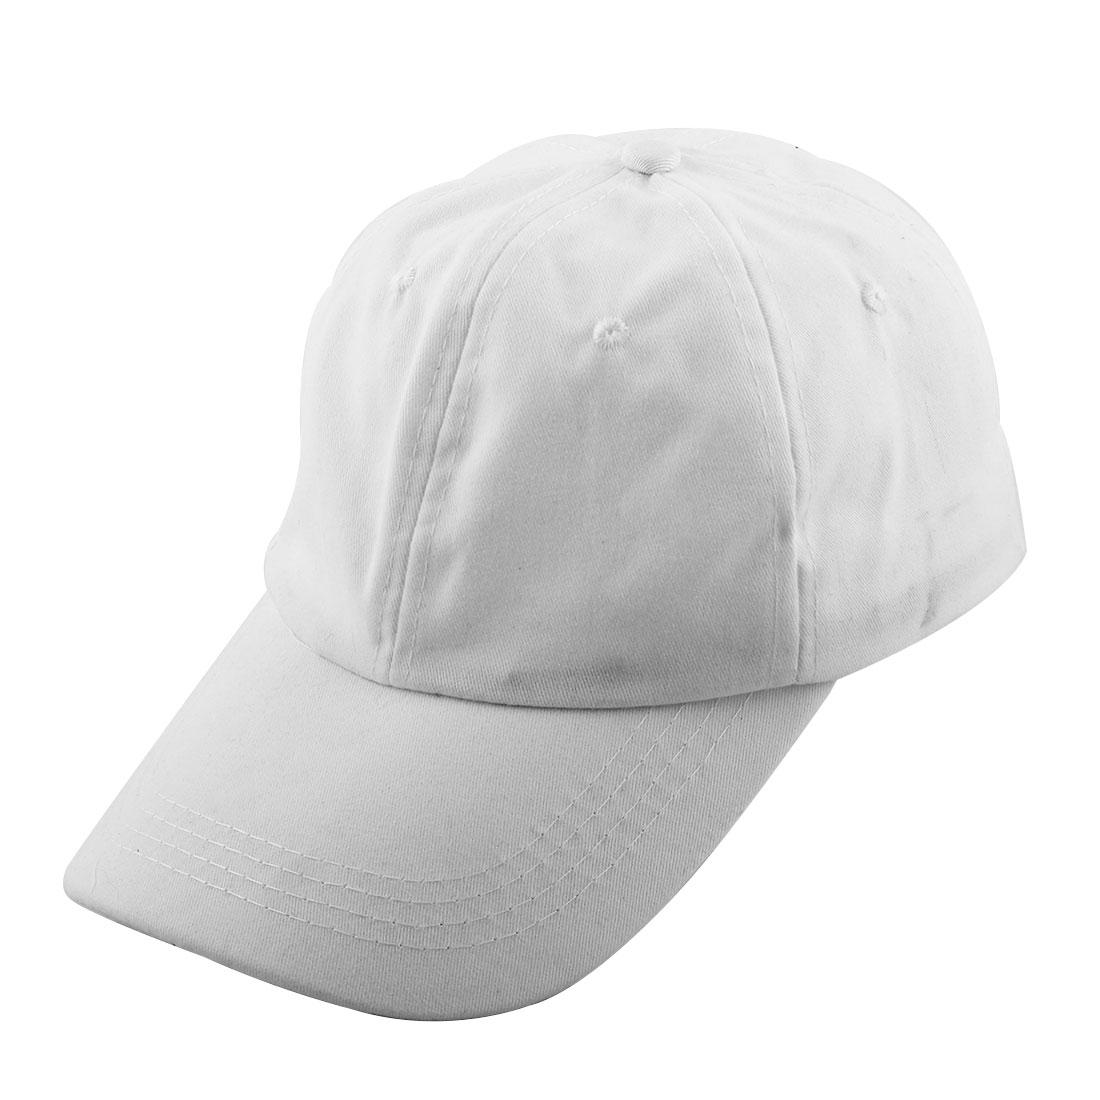 Outdoor Sports Cotton Blends 6 Panel Adjustable Loop Baseball Cap Portable Golf Hat White